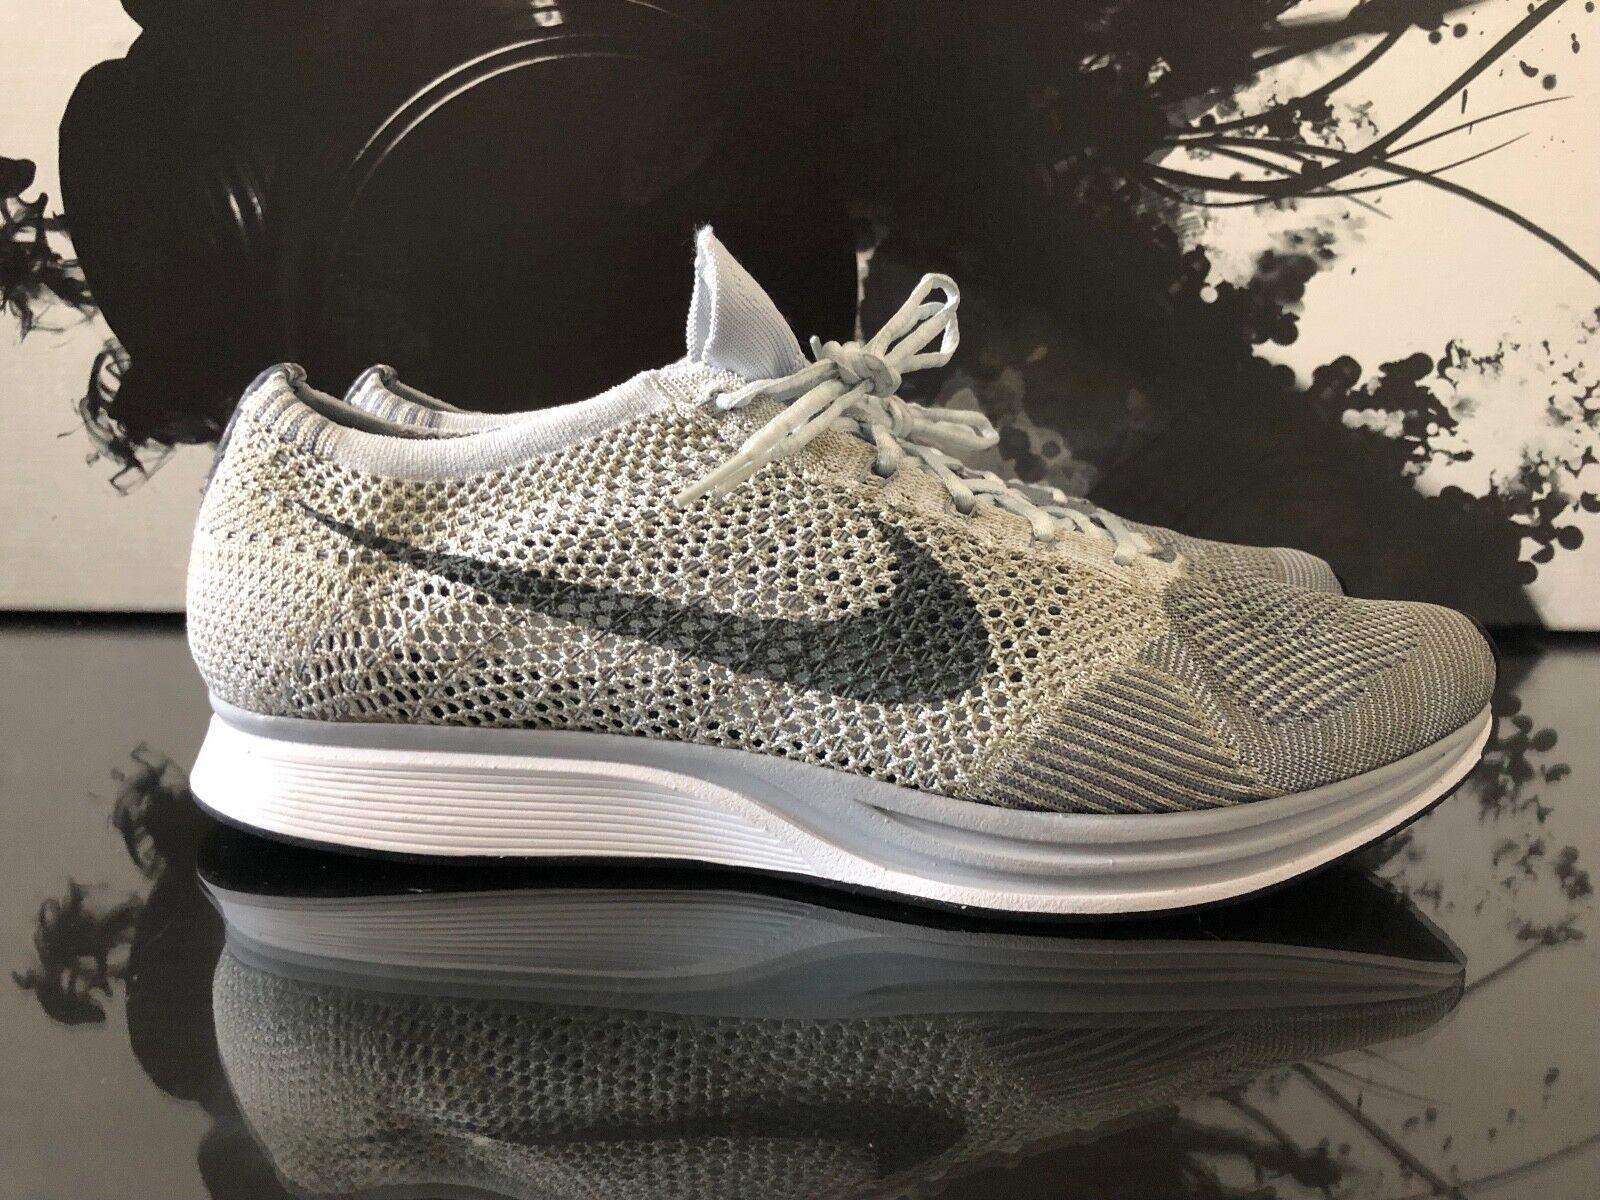 Nike platnium